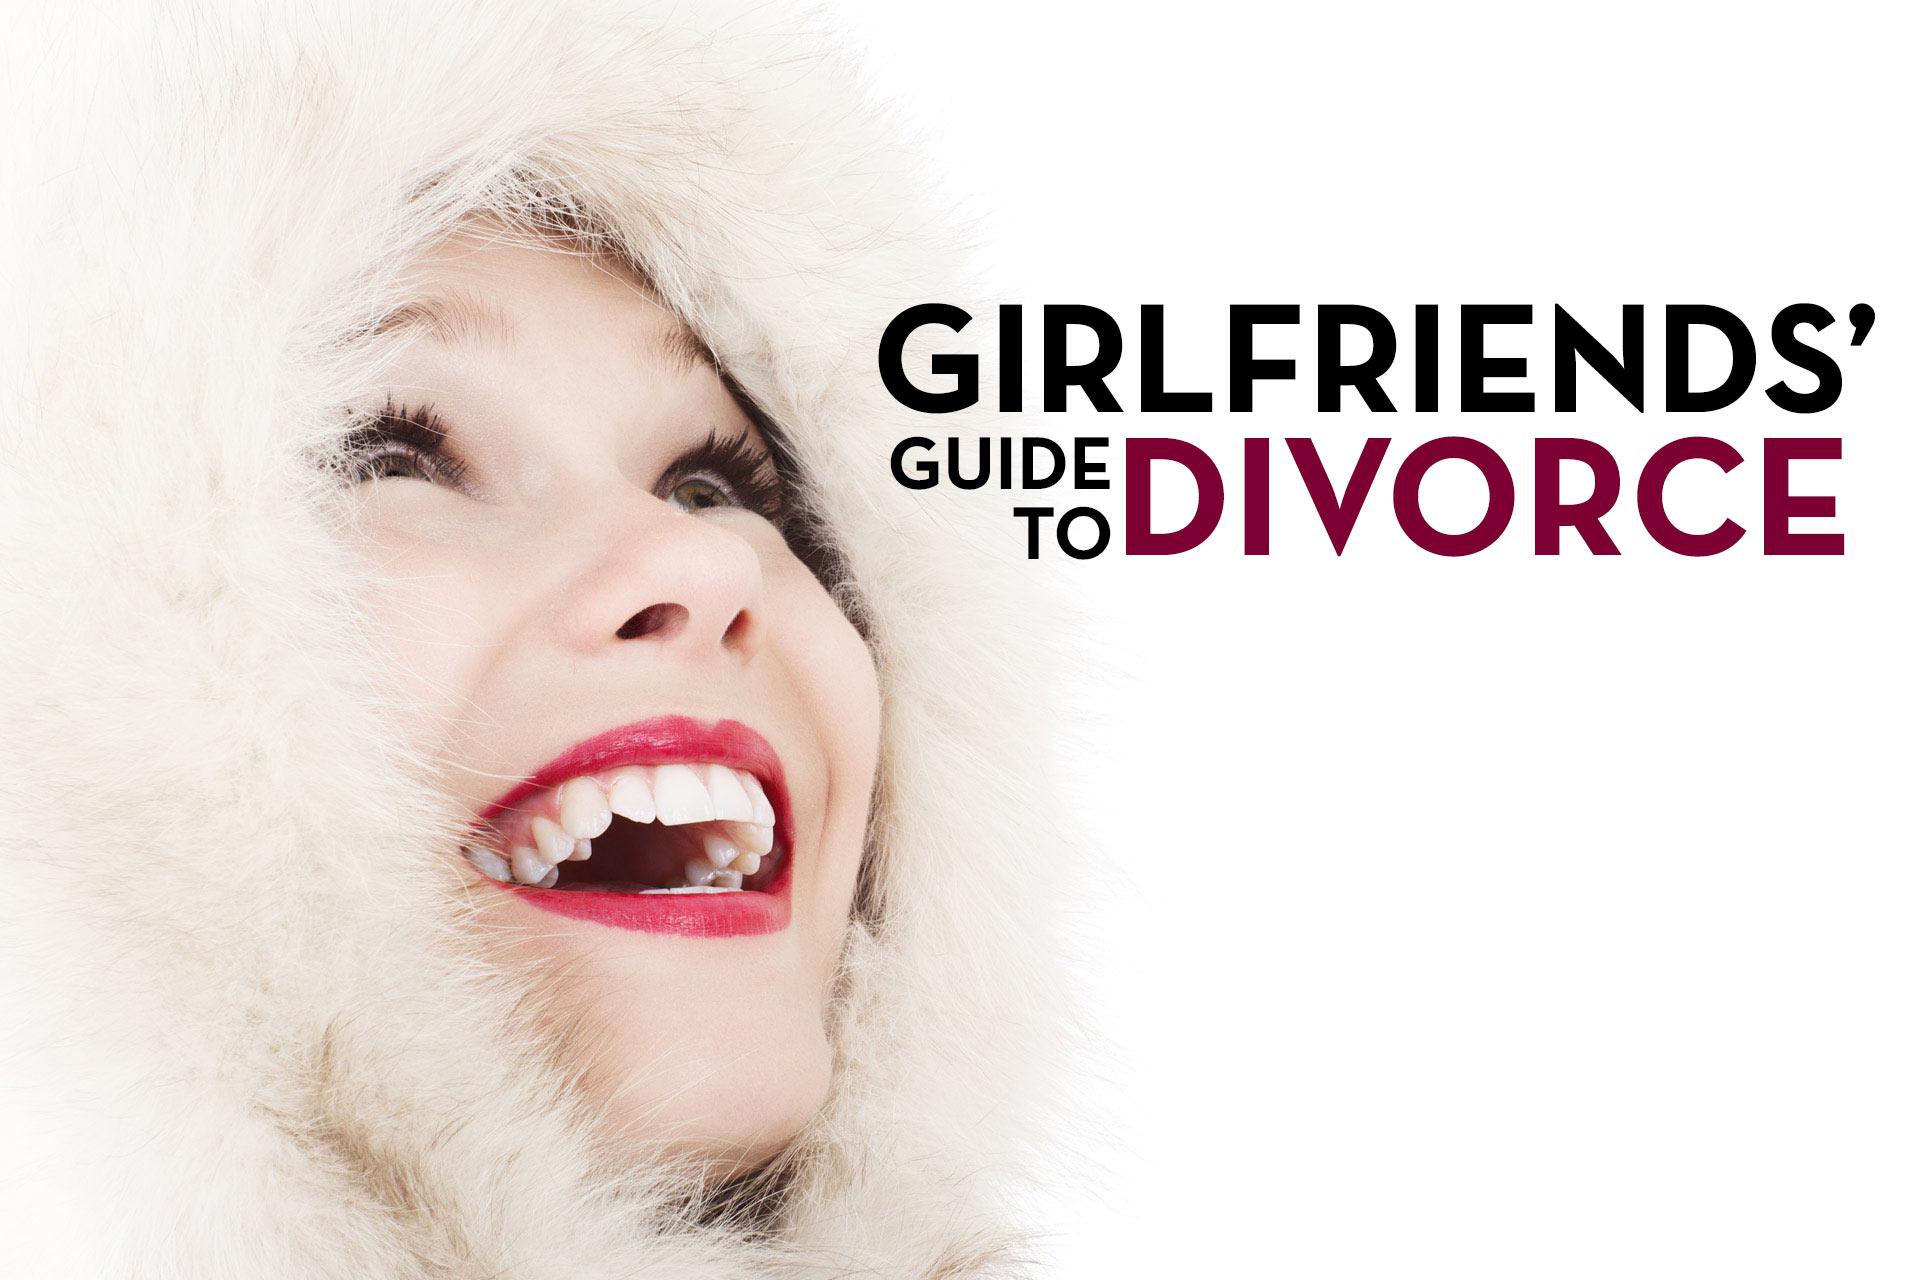 Bravo's Girlfriends' Guide to Divorce